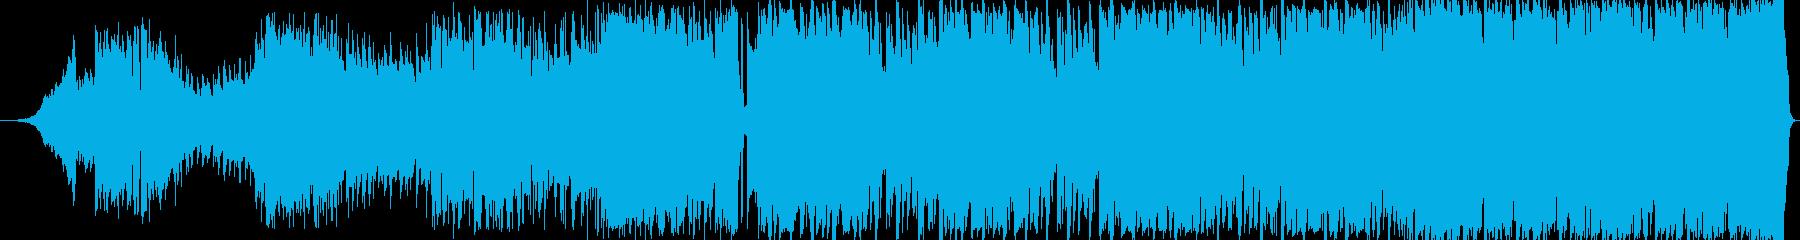 90sなオシャレで疾走感溢れるEDM洋楽の再生済みの波形